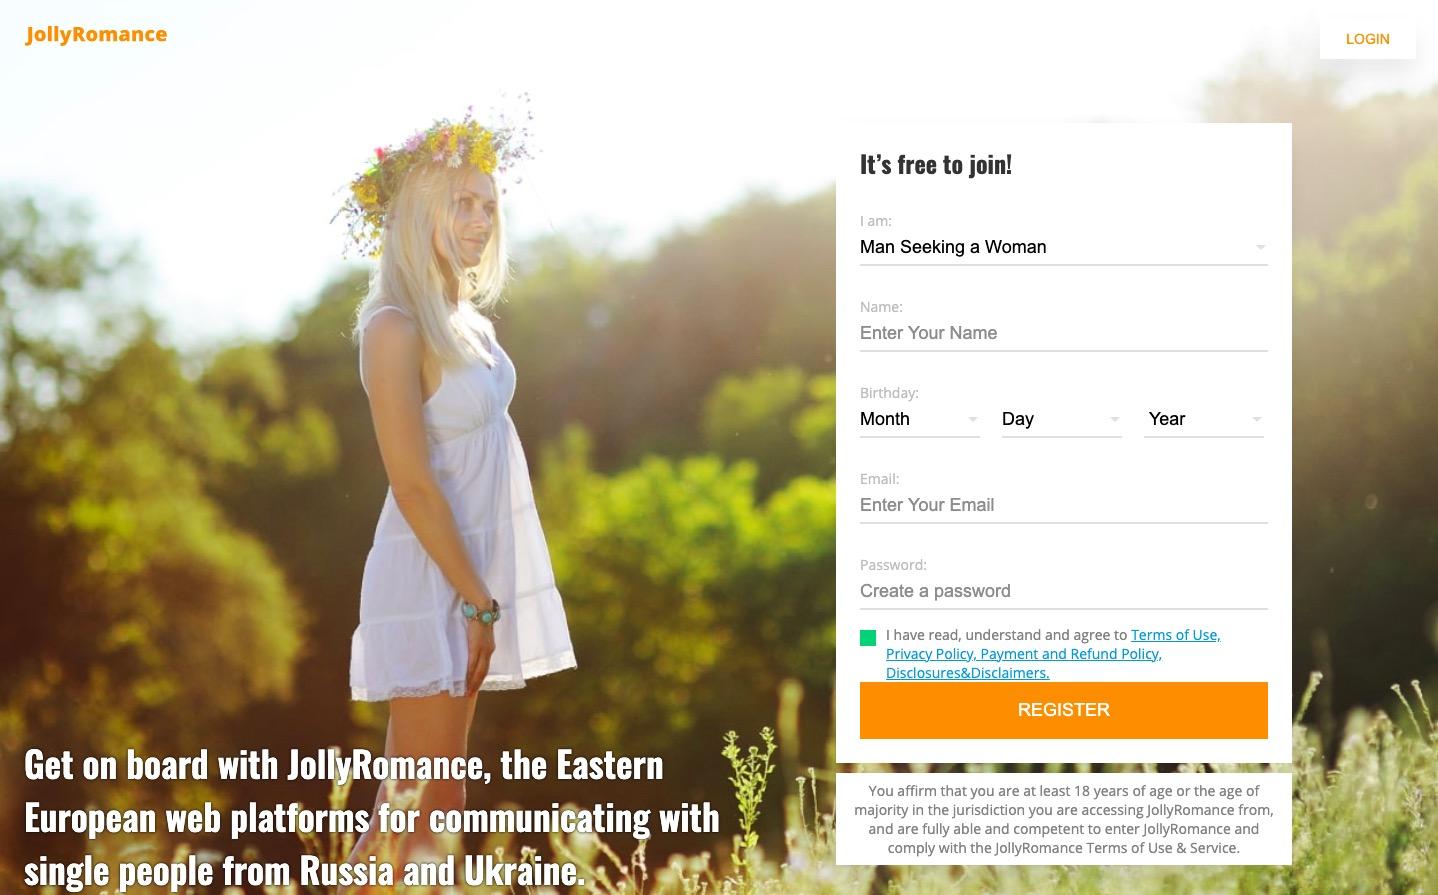 JollyRomance main page